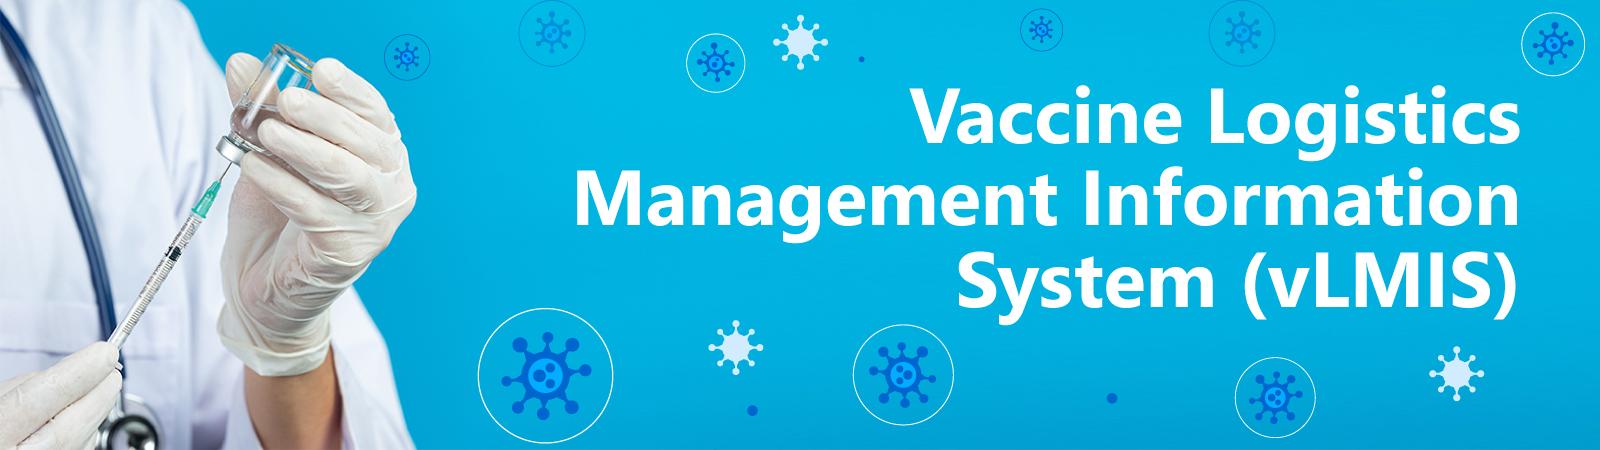 Vaccine Logistics Management System